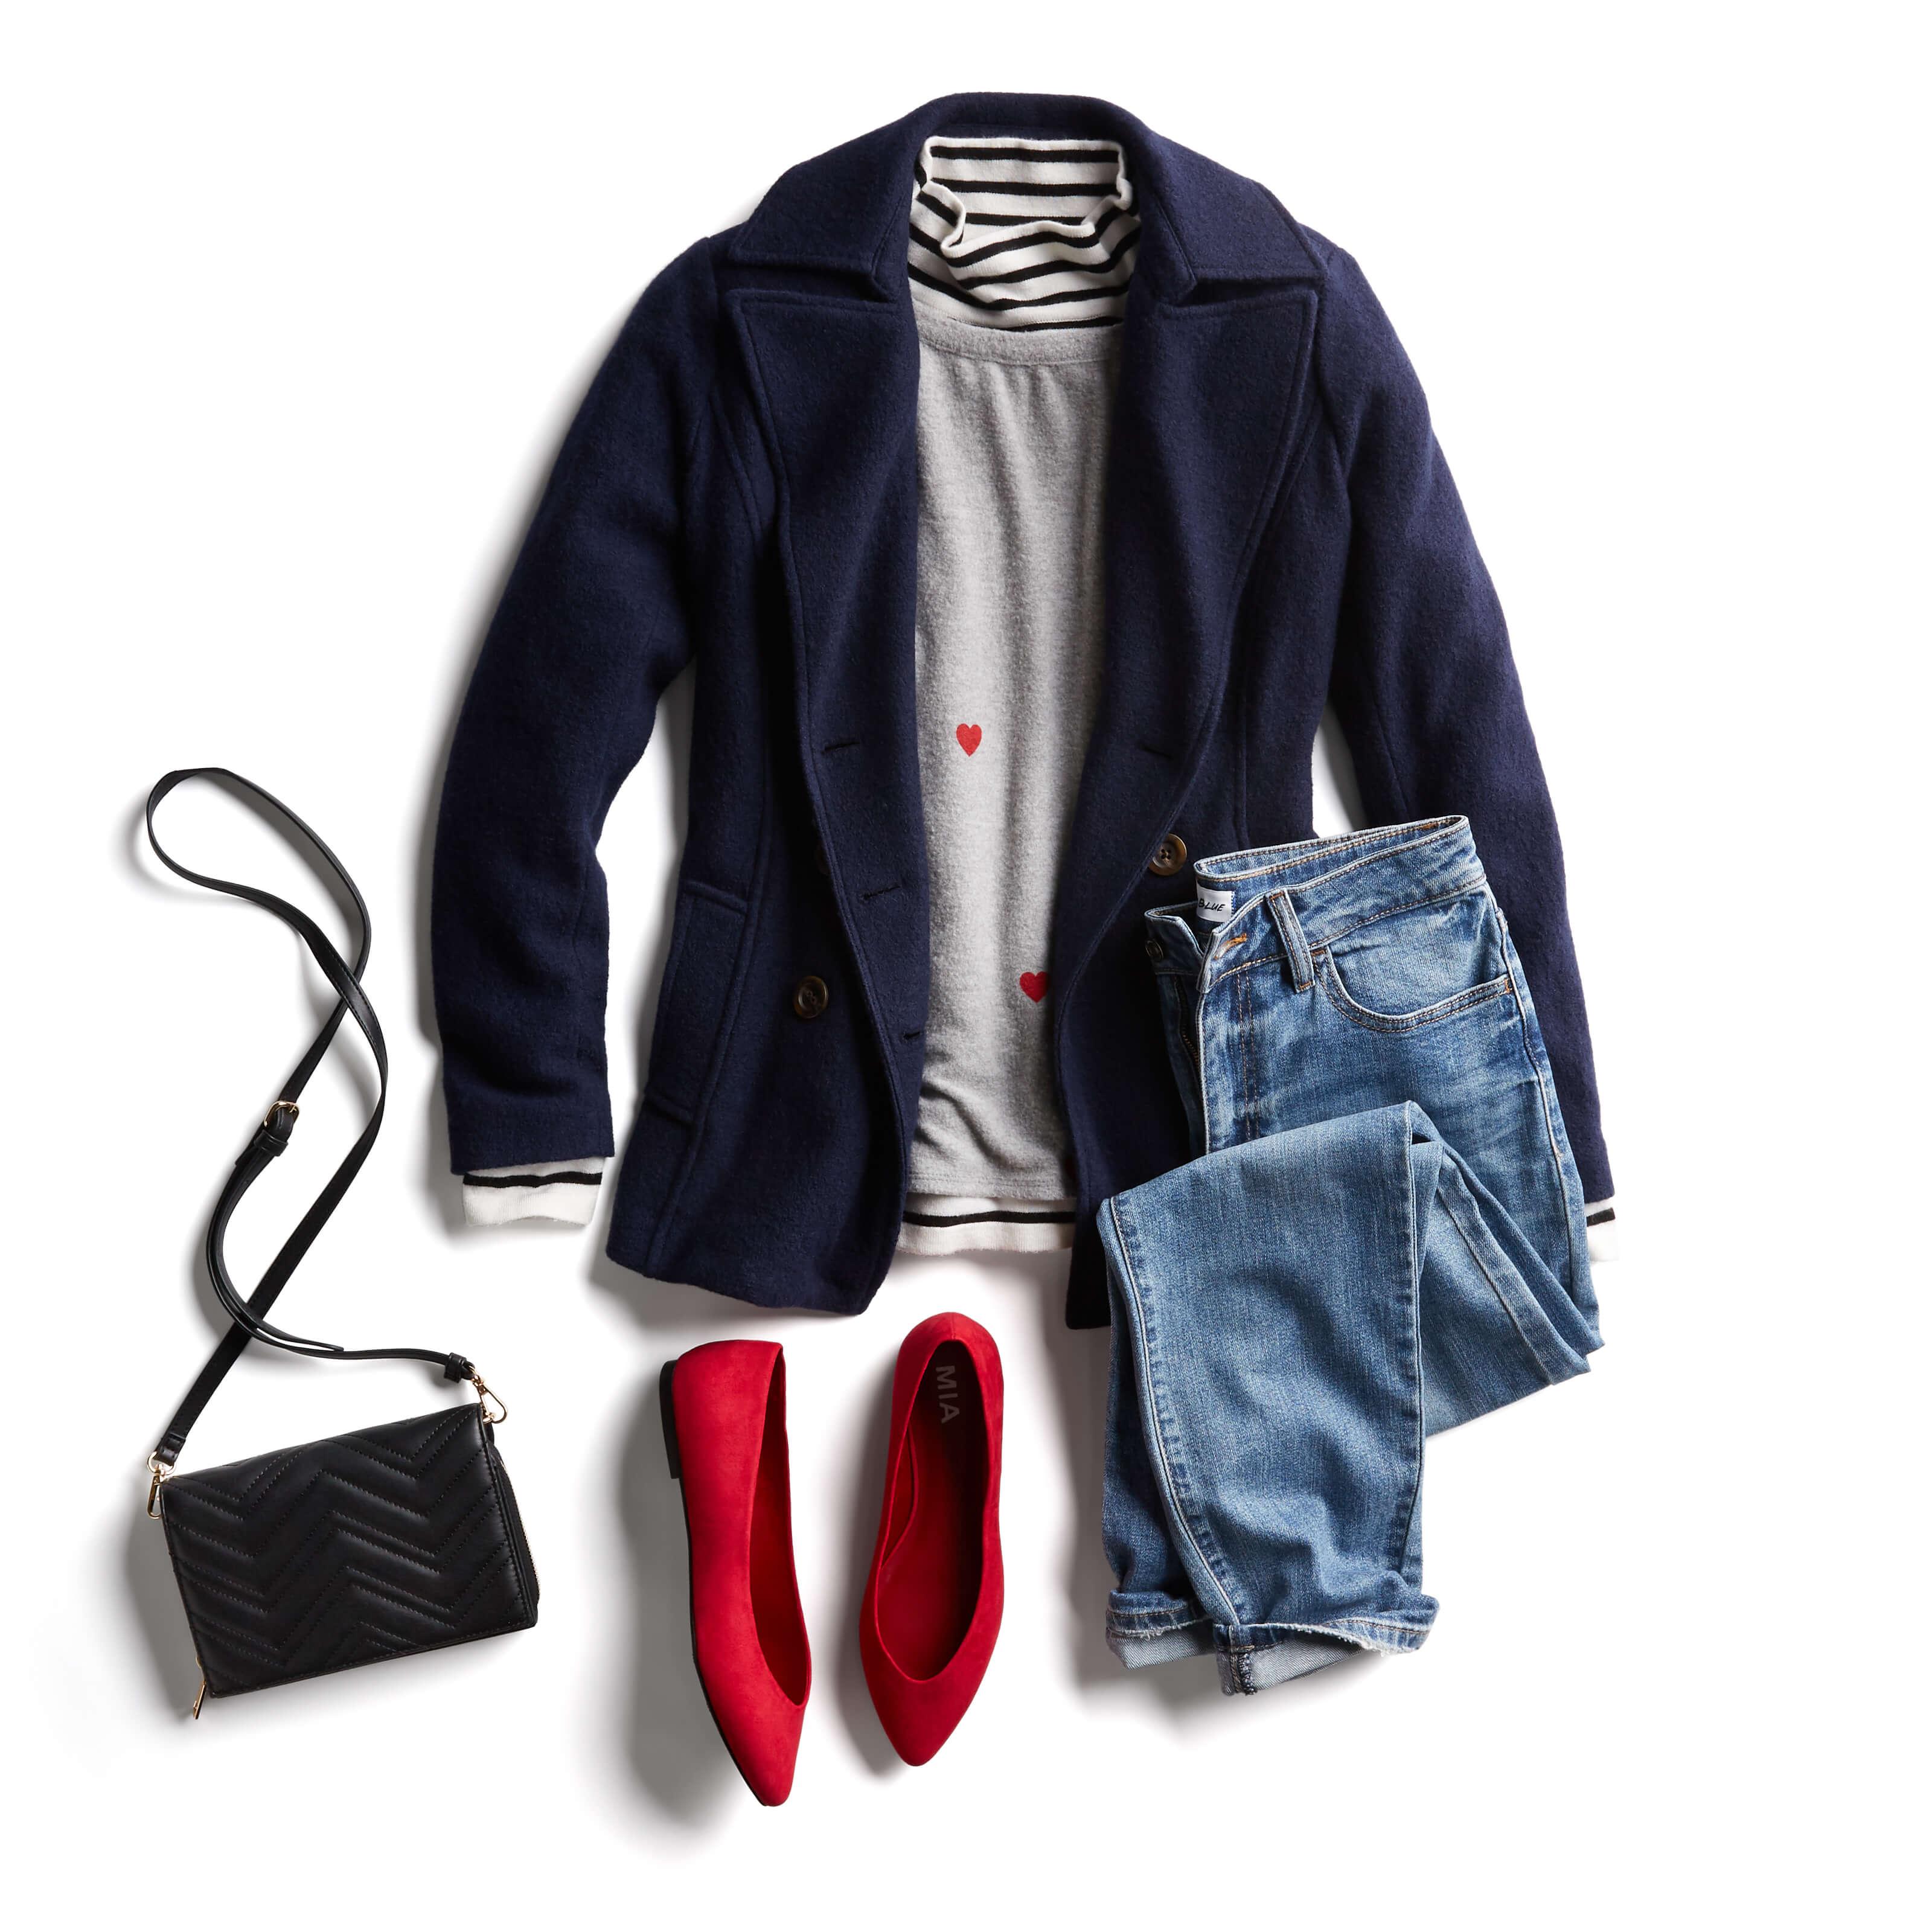 light jacket and flats